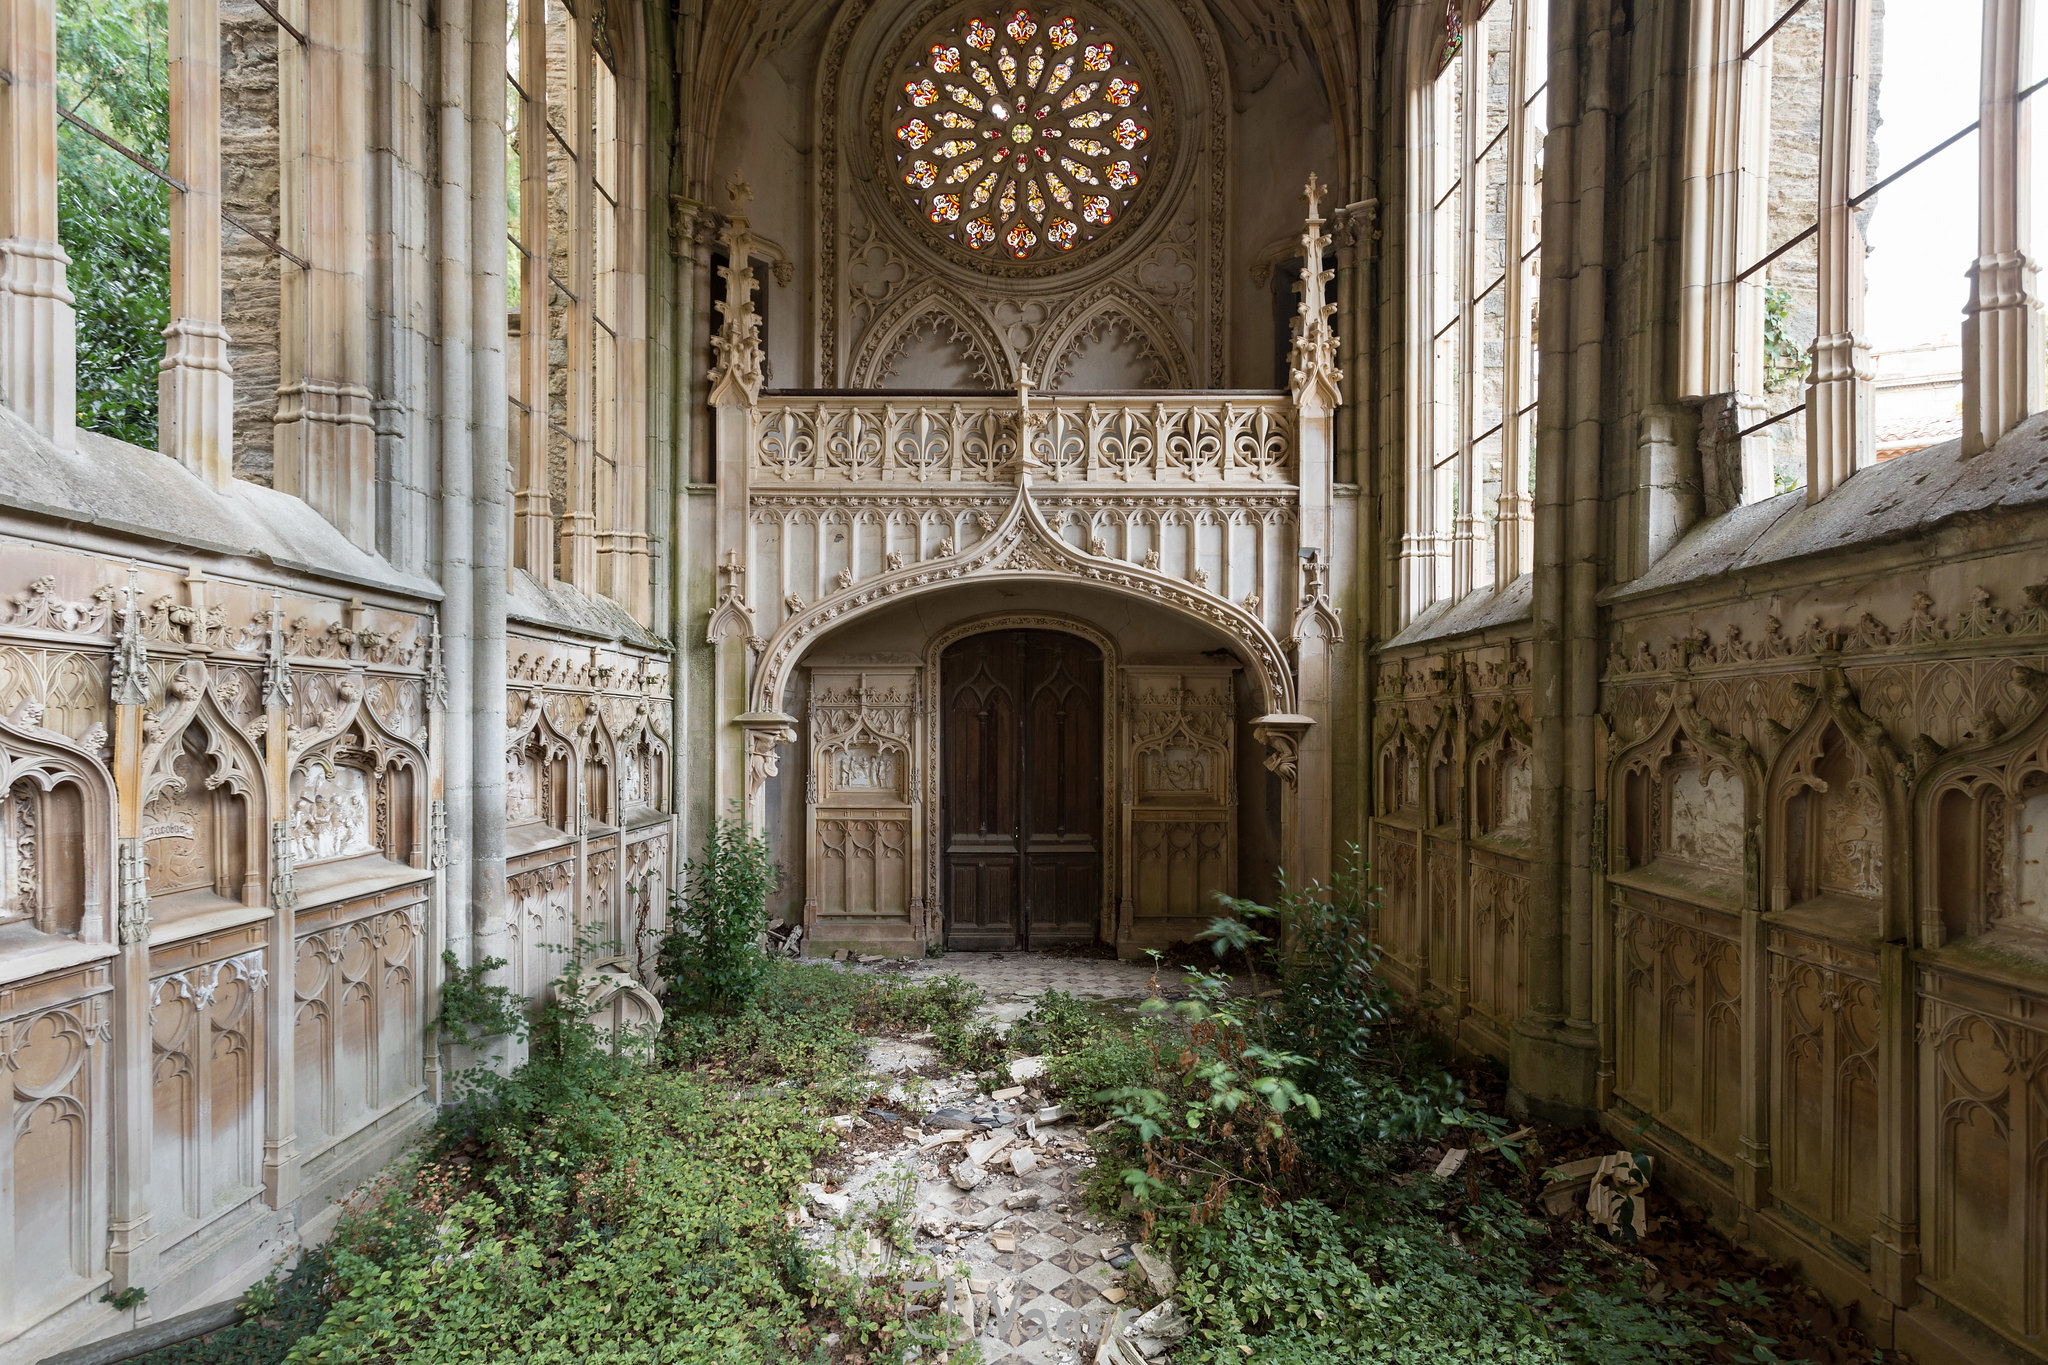 Abandoned Church abandoned church in france [2048x1365]el vagus : abandonedporn